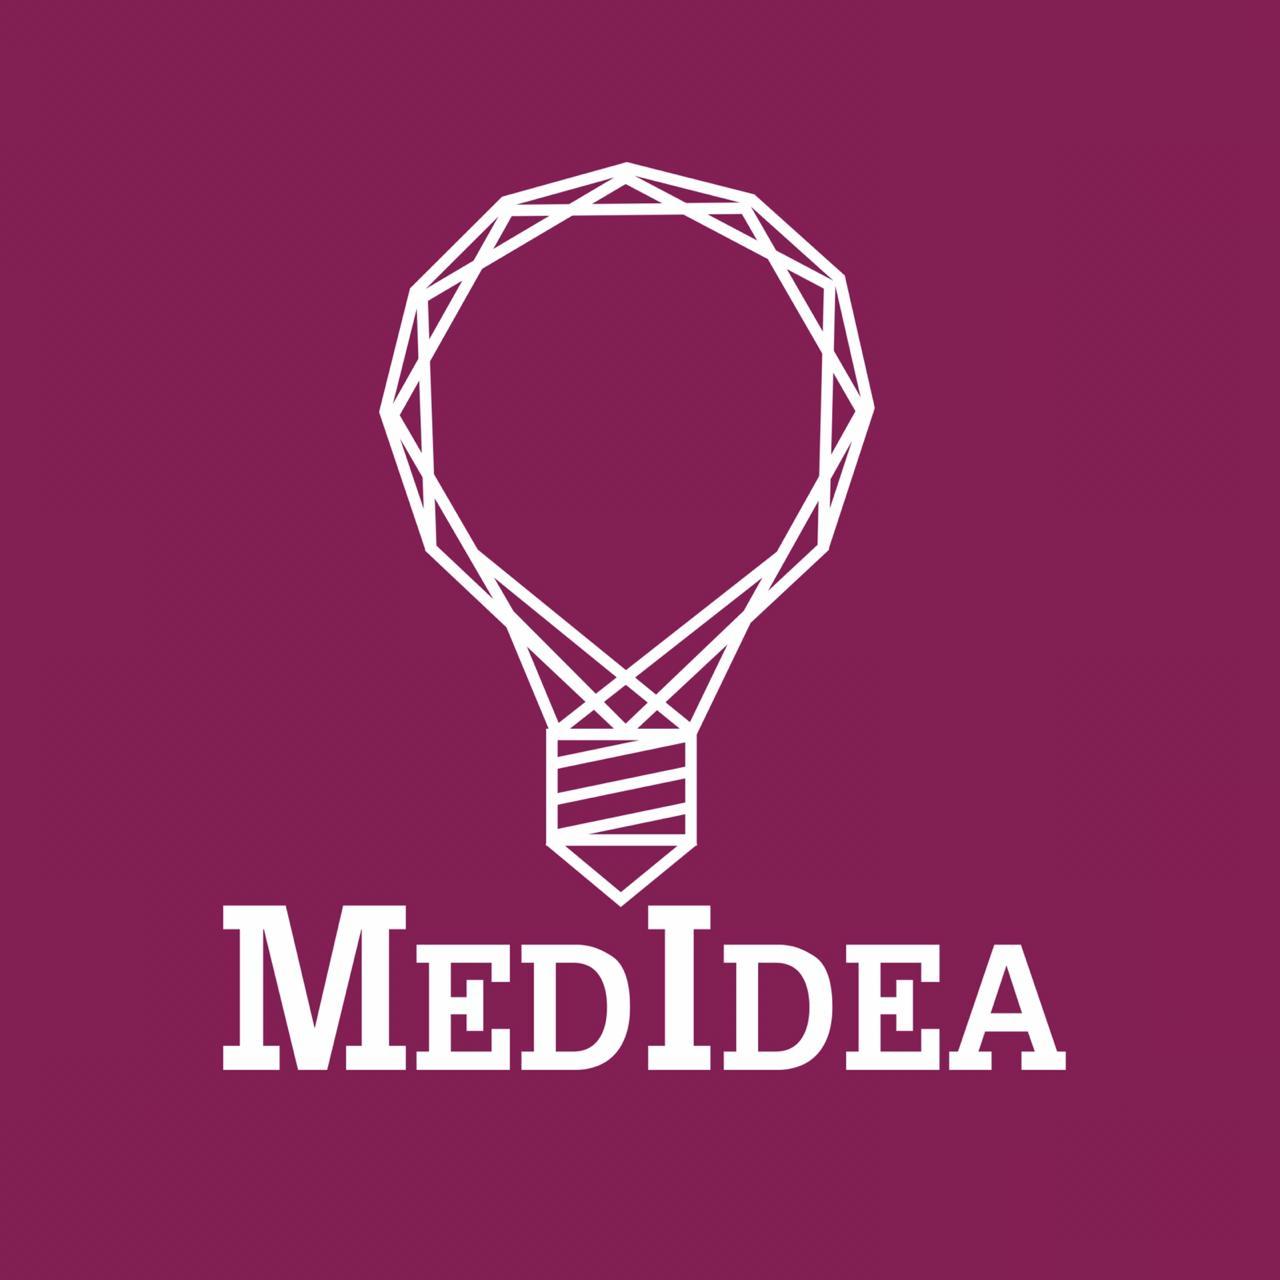 MEDIDEA